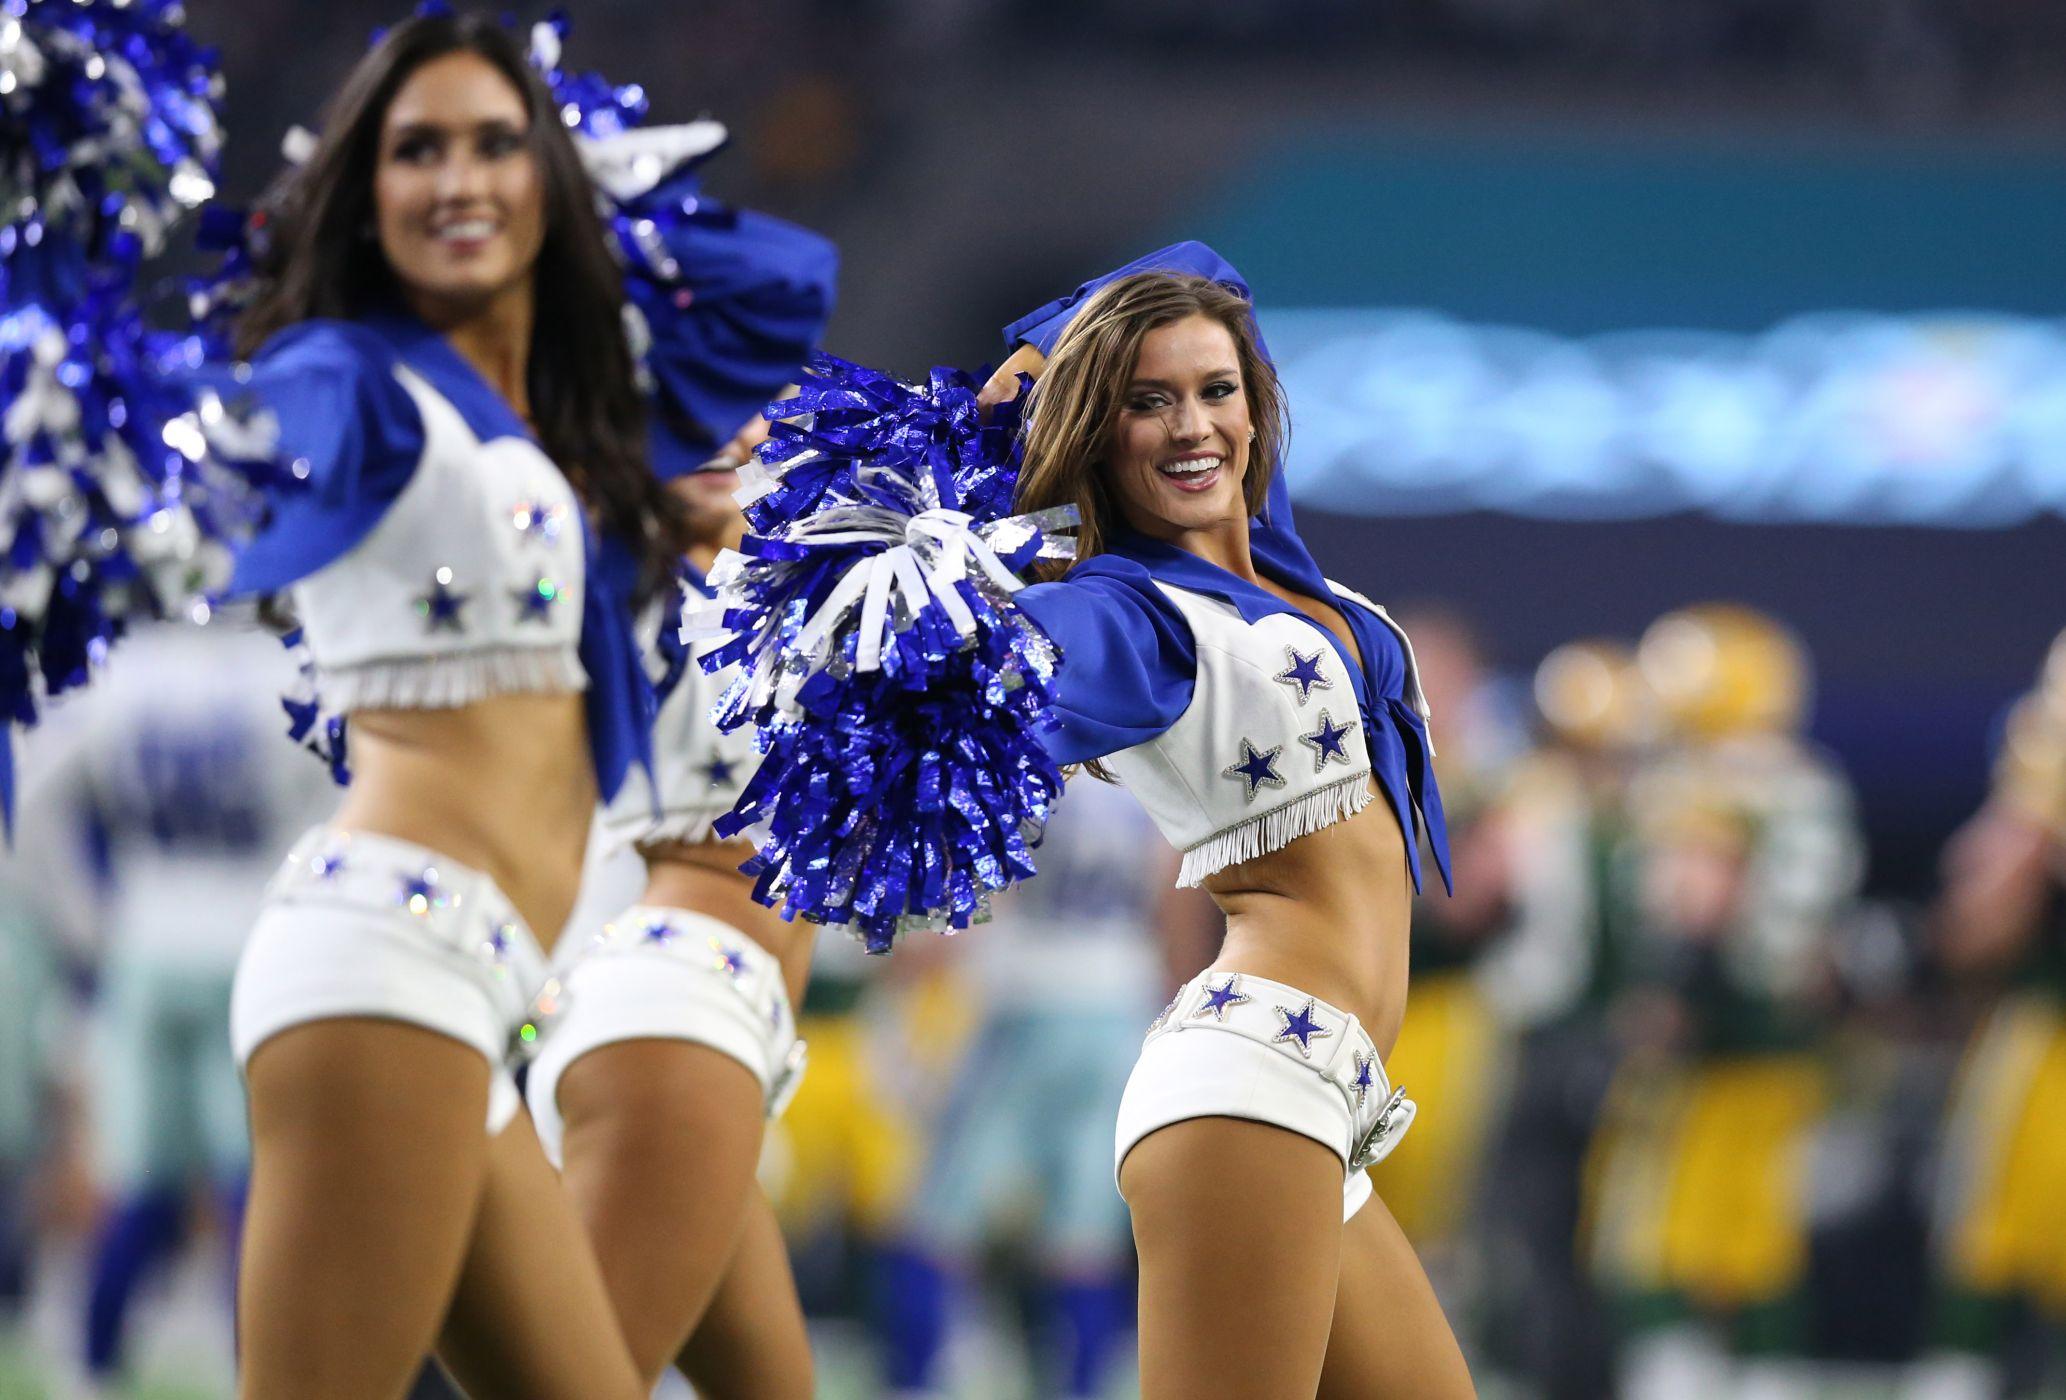 Dallas cowboys nfl football sports cheerleader sexy babe girl woman women female wallpaper